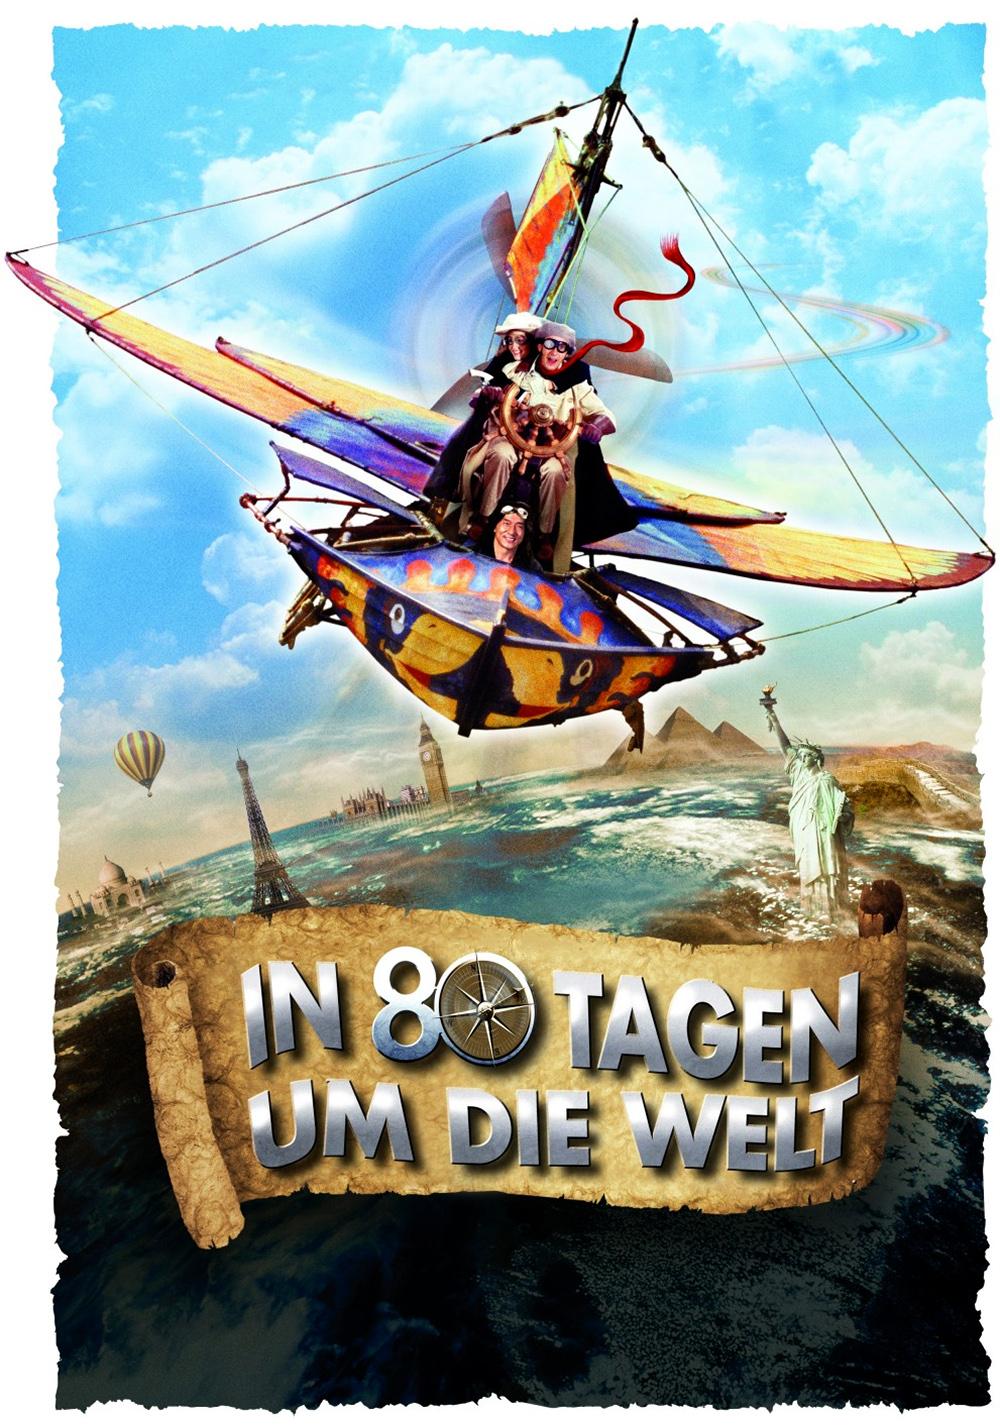 Around The World In 80 Days Movie Poster Image